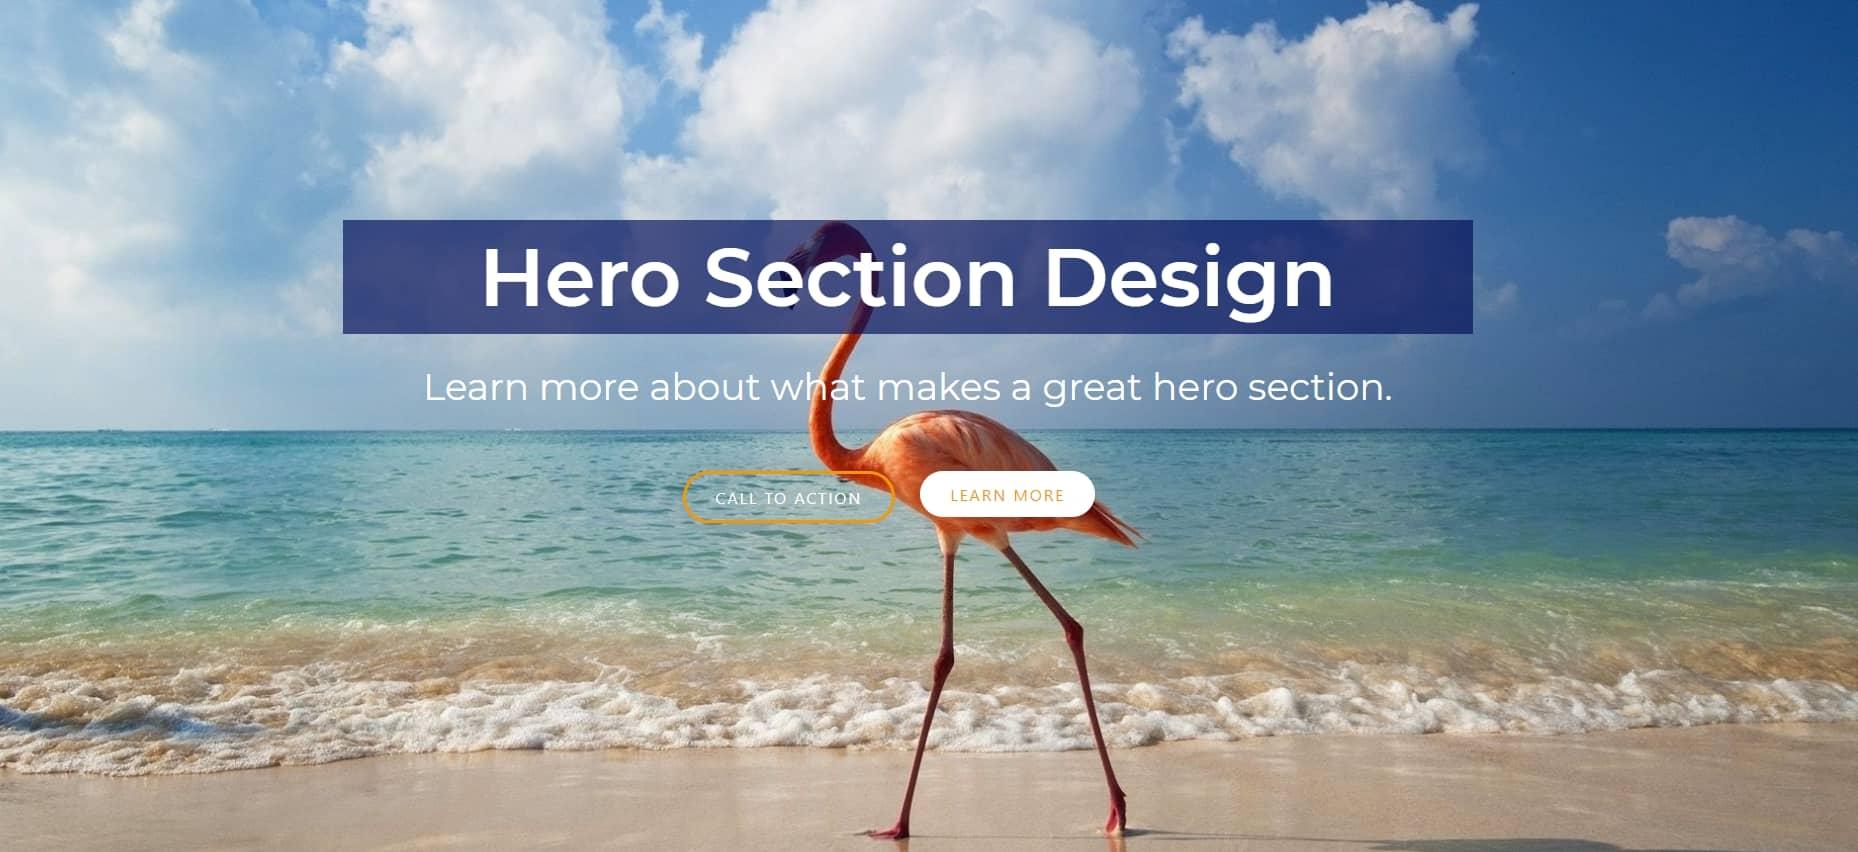 hero section design